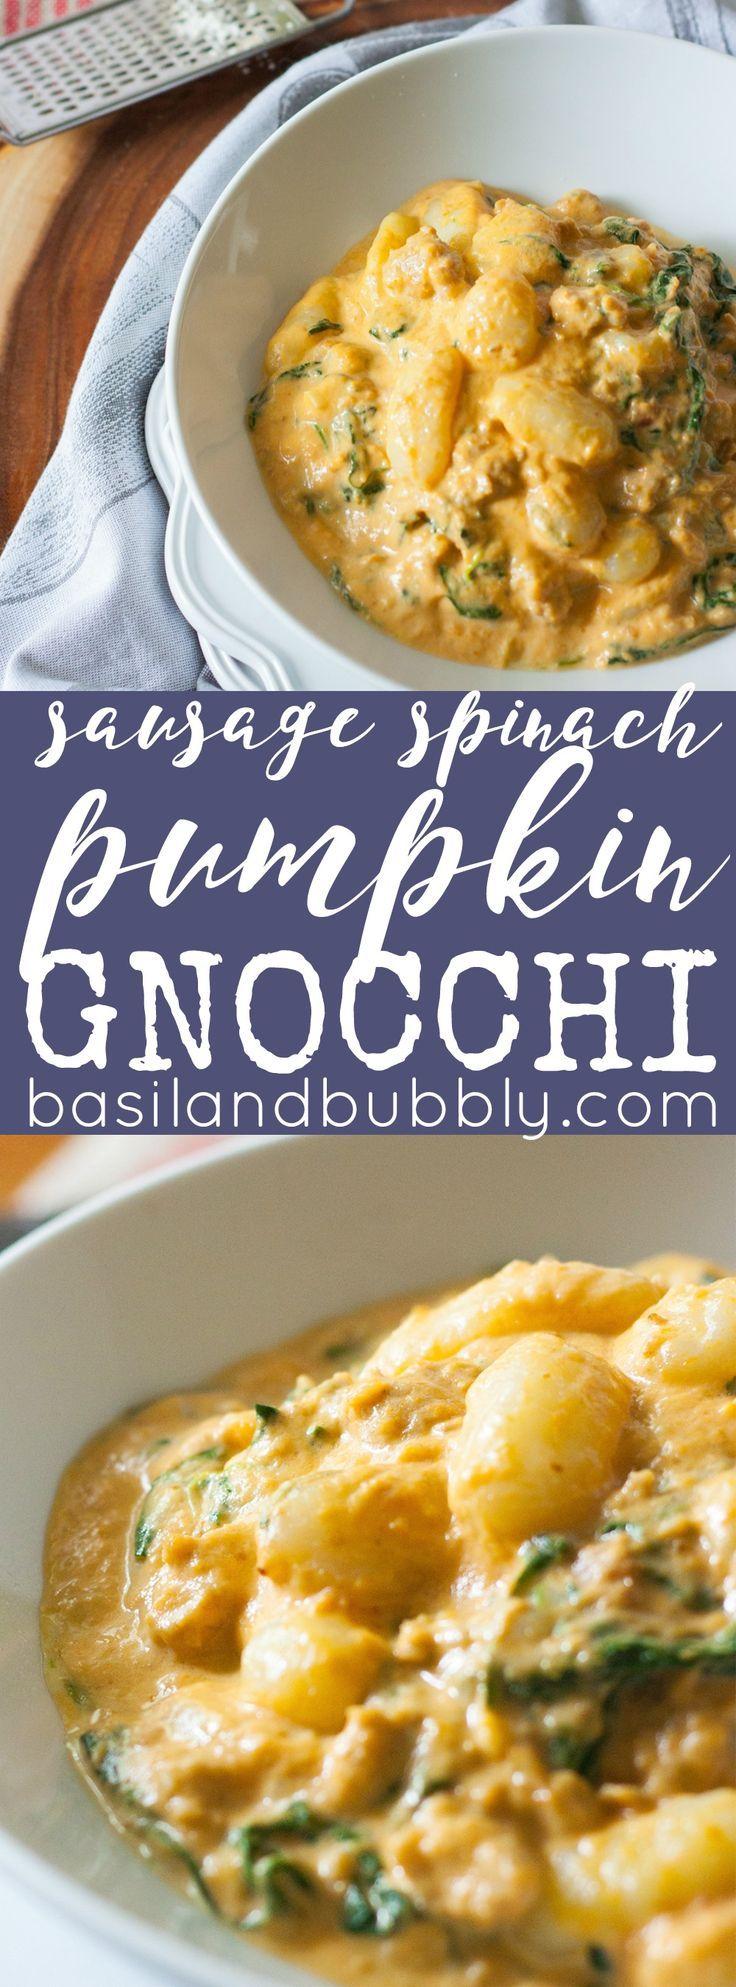 Delicious comfort food - Sausage, Spinach Pumpkin Gnocchi Alfredo.  My favorite of my savory pumpkin recipes!